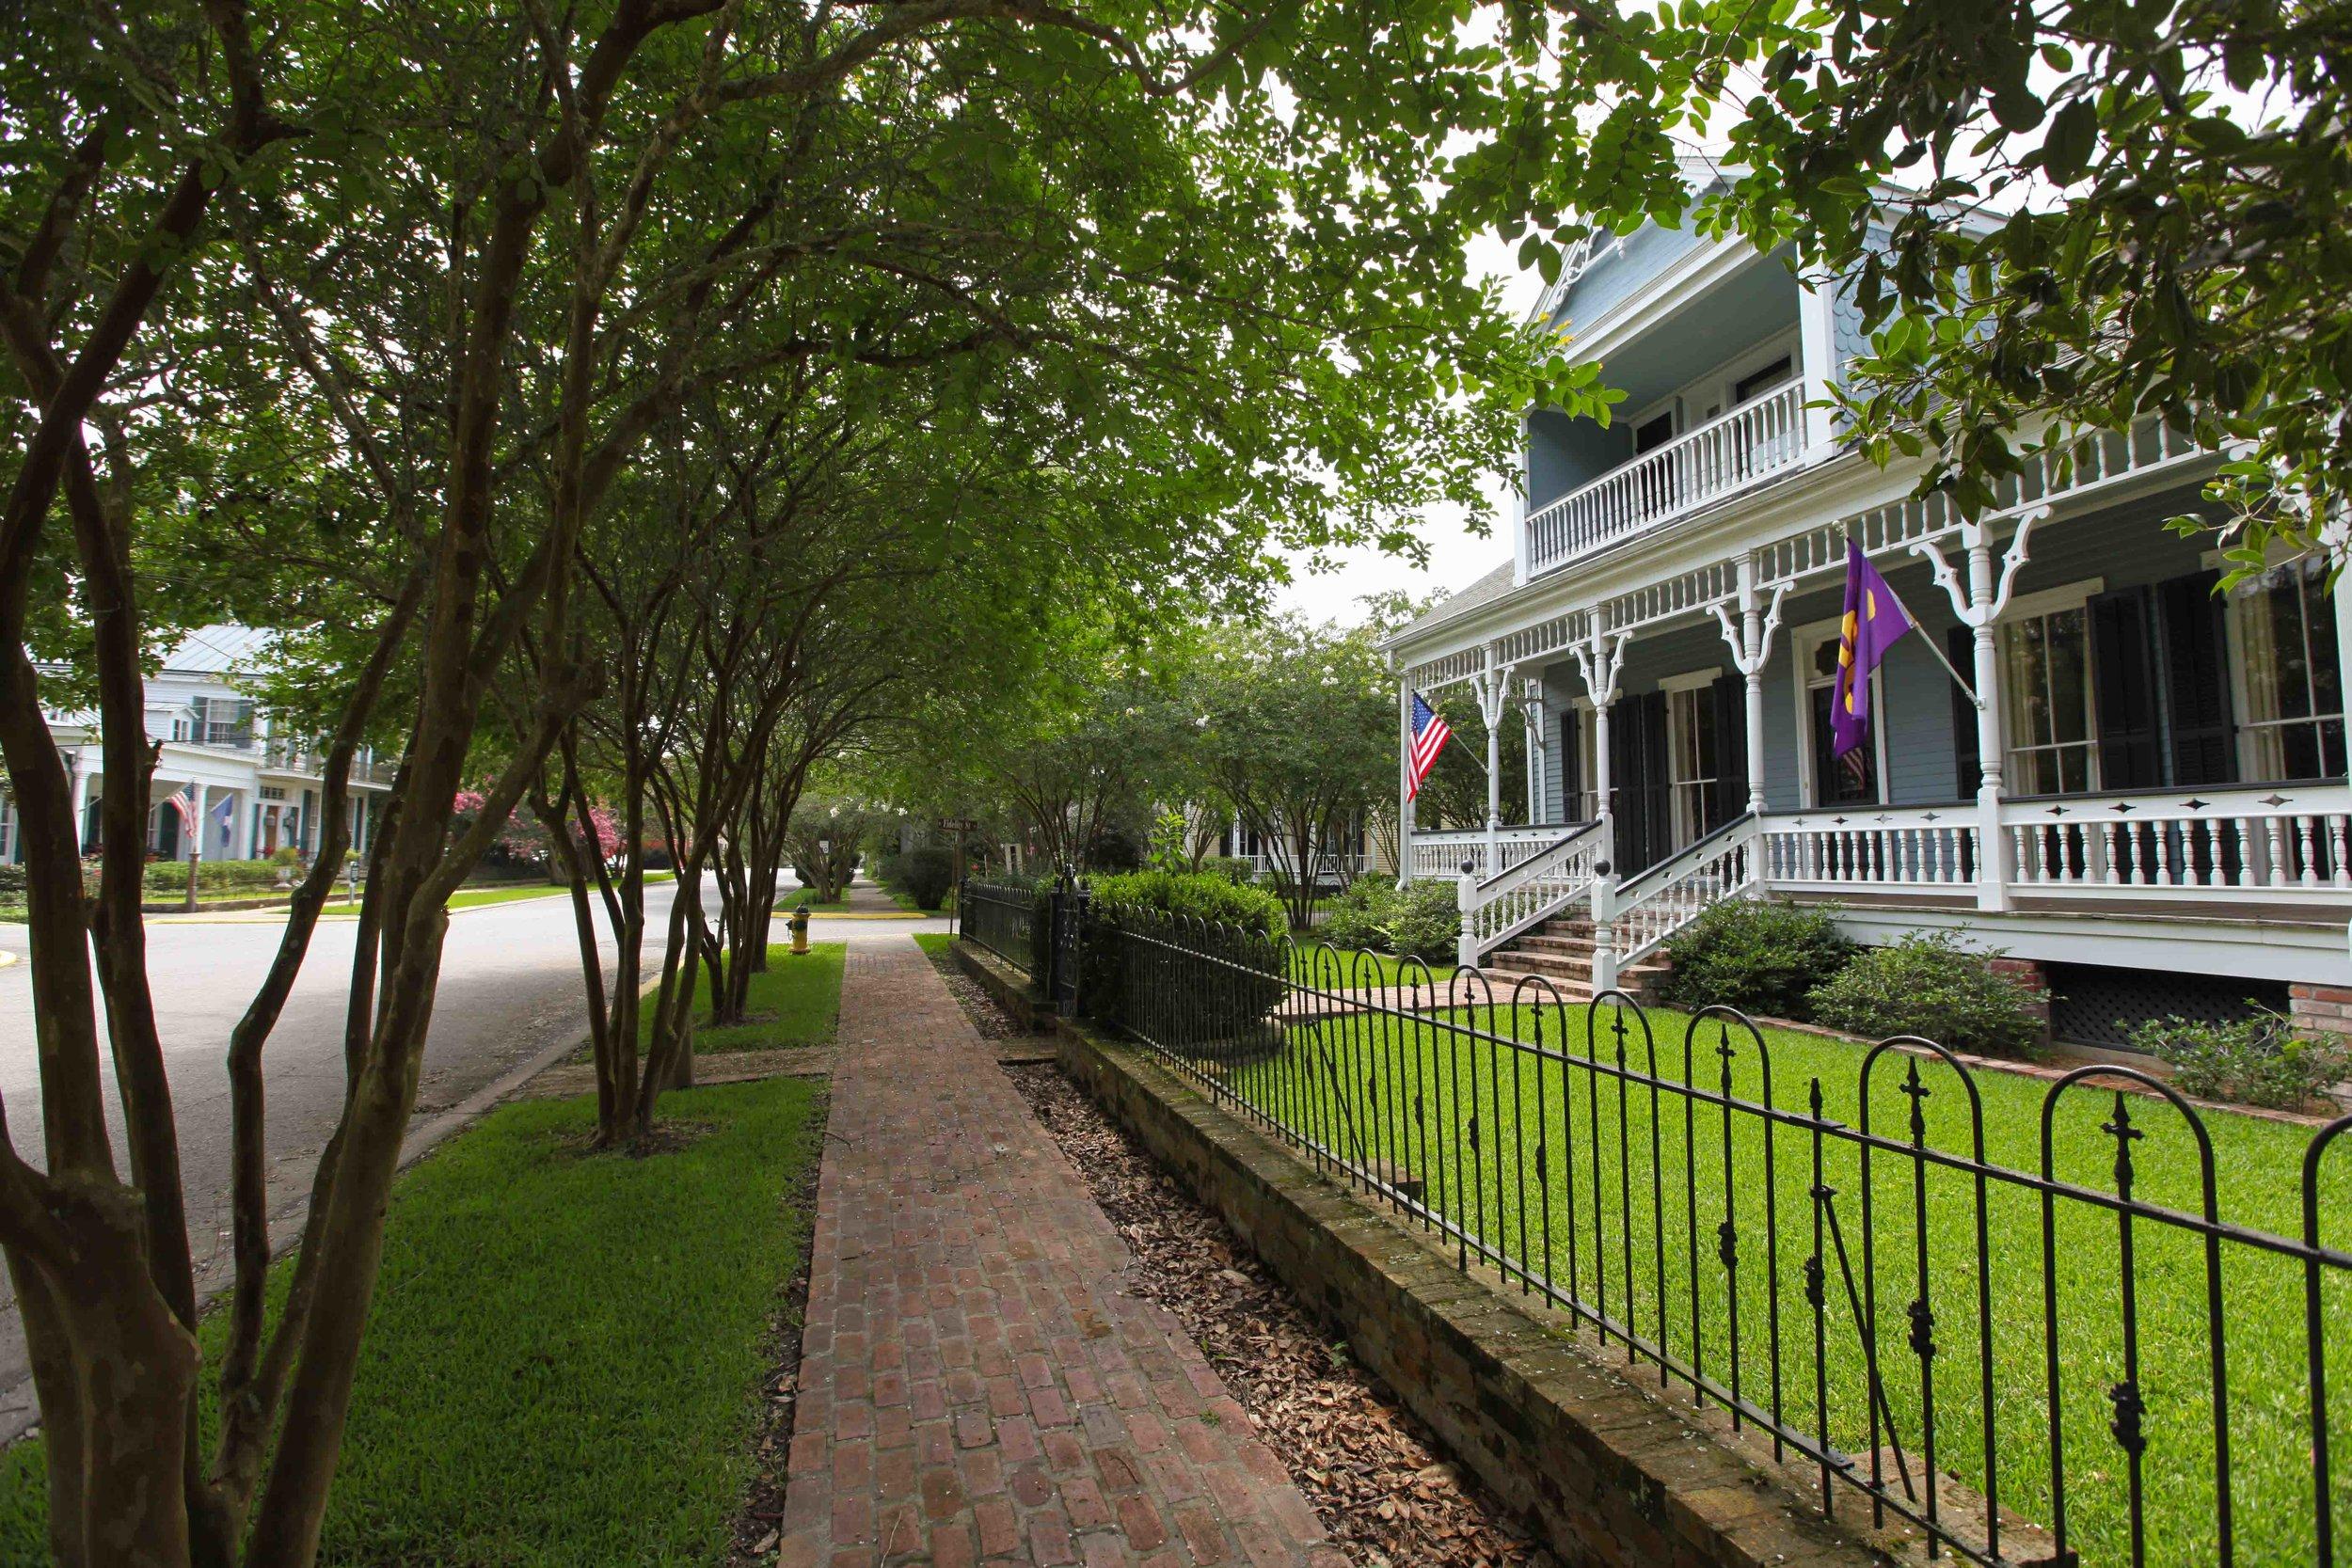 St Francisville in Feliciana Parish - comfortable, historic, white.